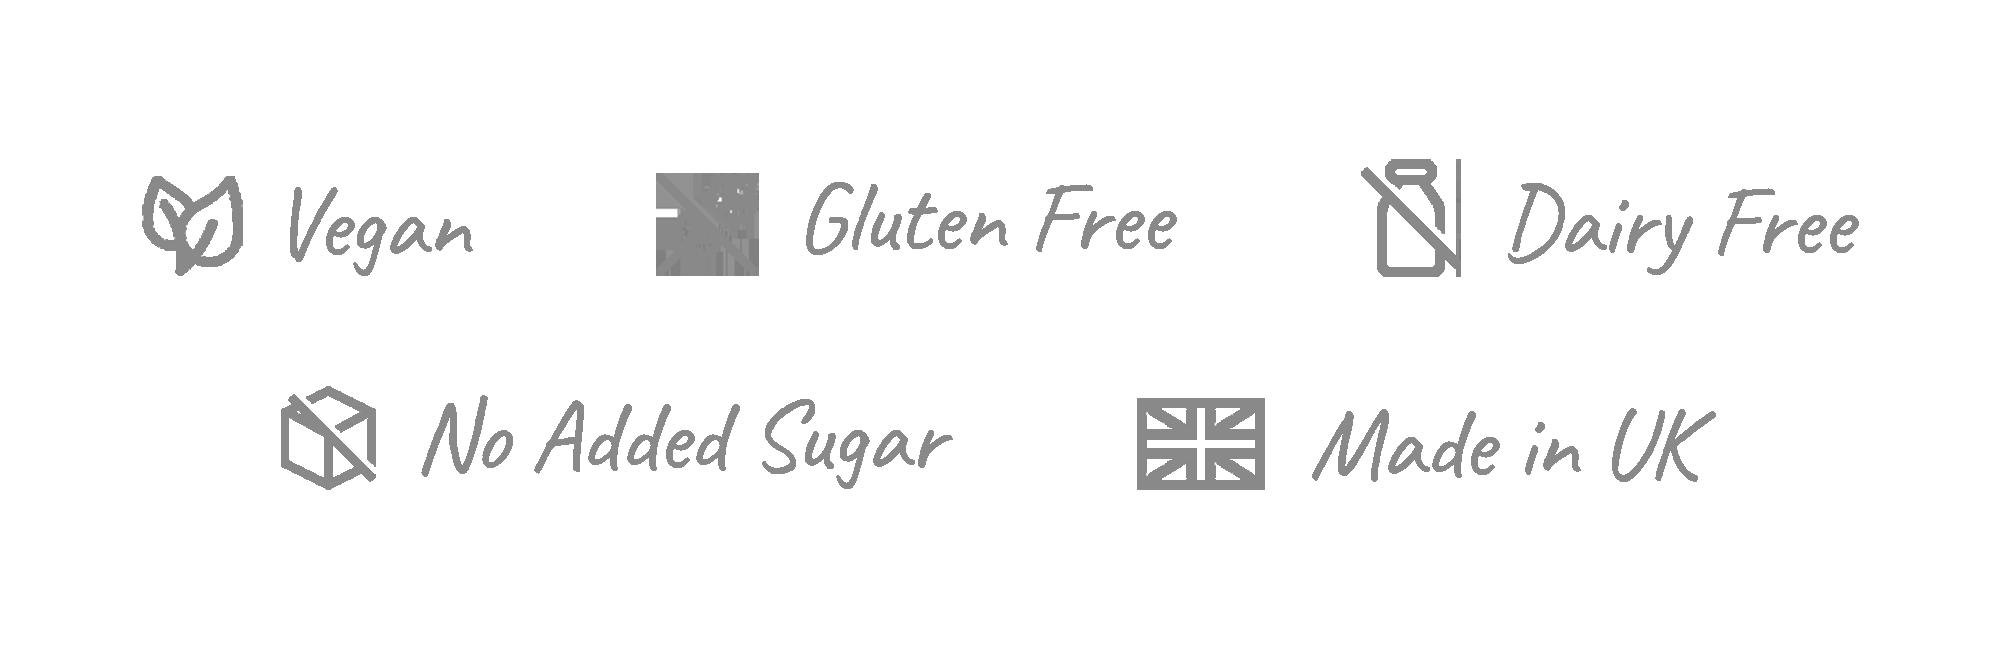 vegan, gluten free, dairy free, no added sugar, made in the UK